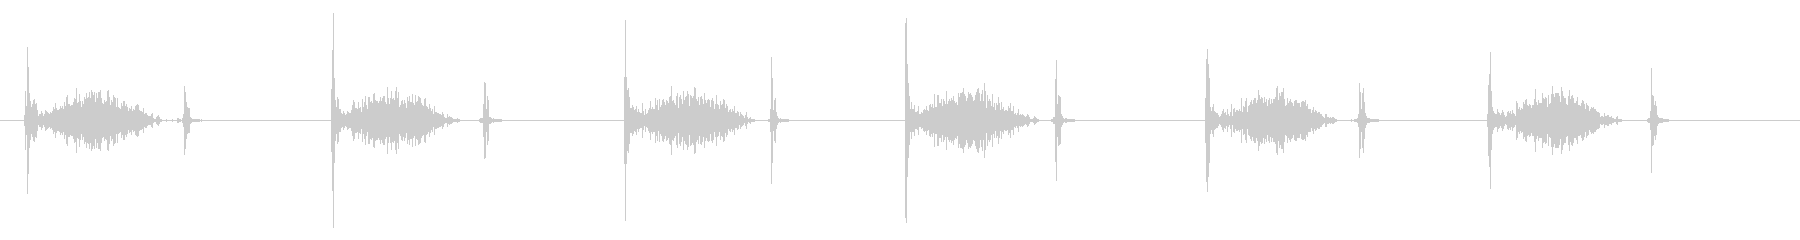 PC マウス ムーブ02-08(木)の未再生の波形